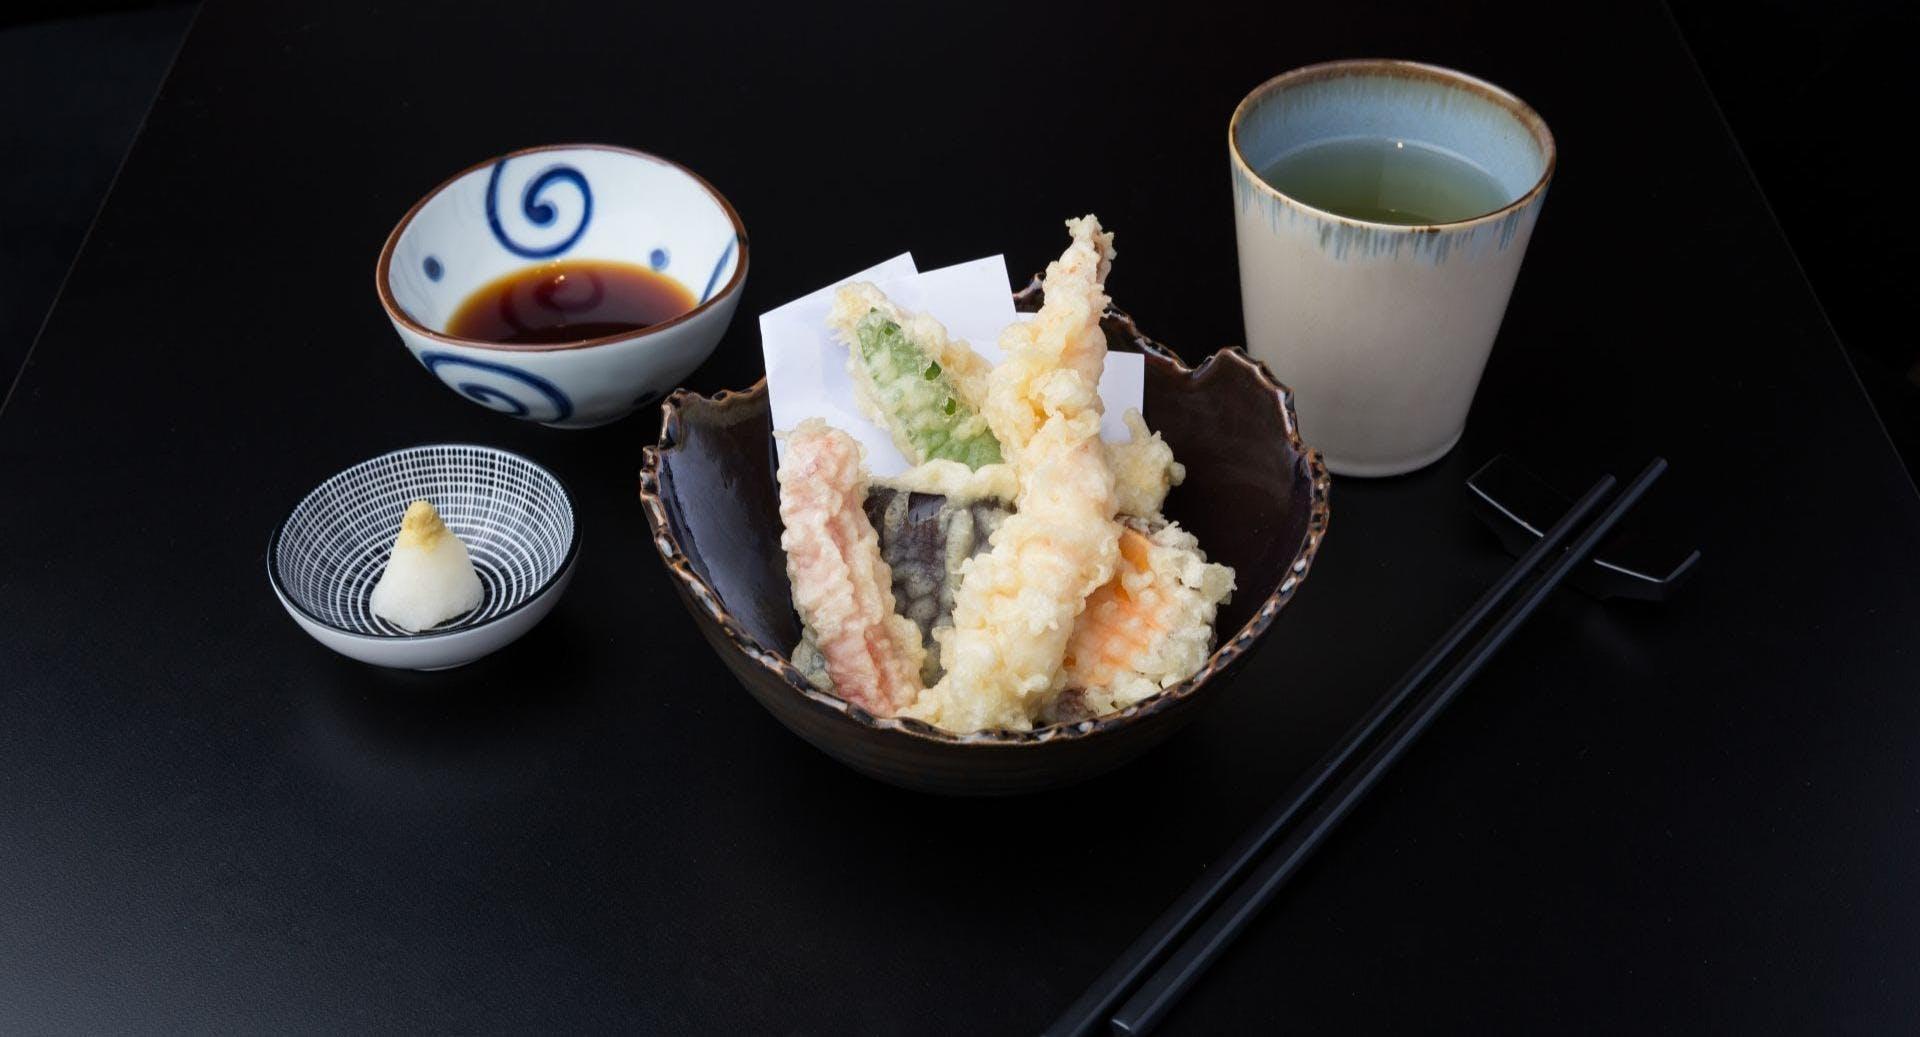 Zen Japanese Restauarant and Bar - Zentrum Köln image 2